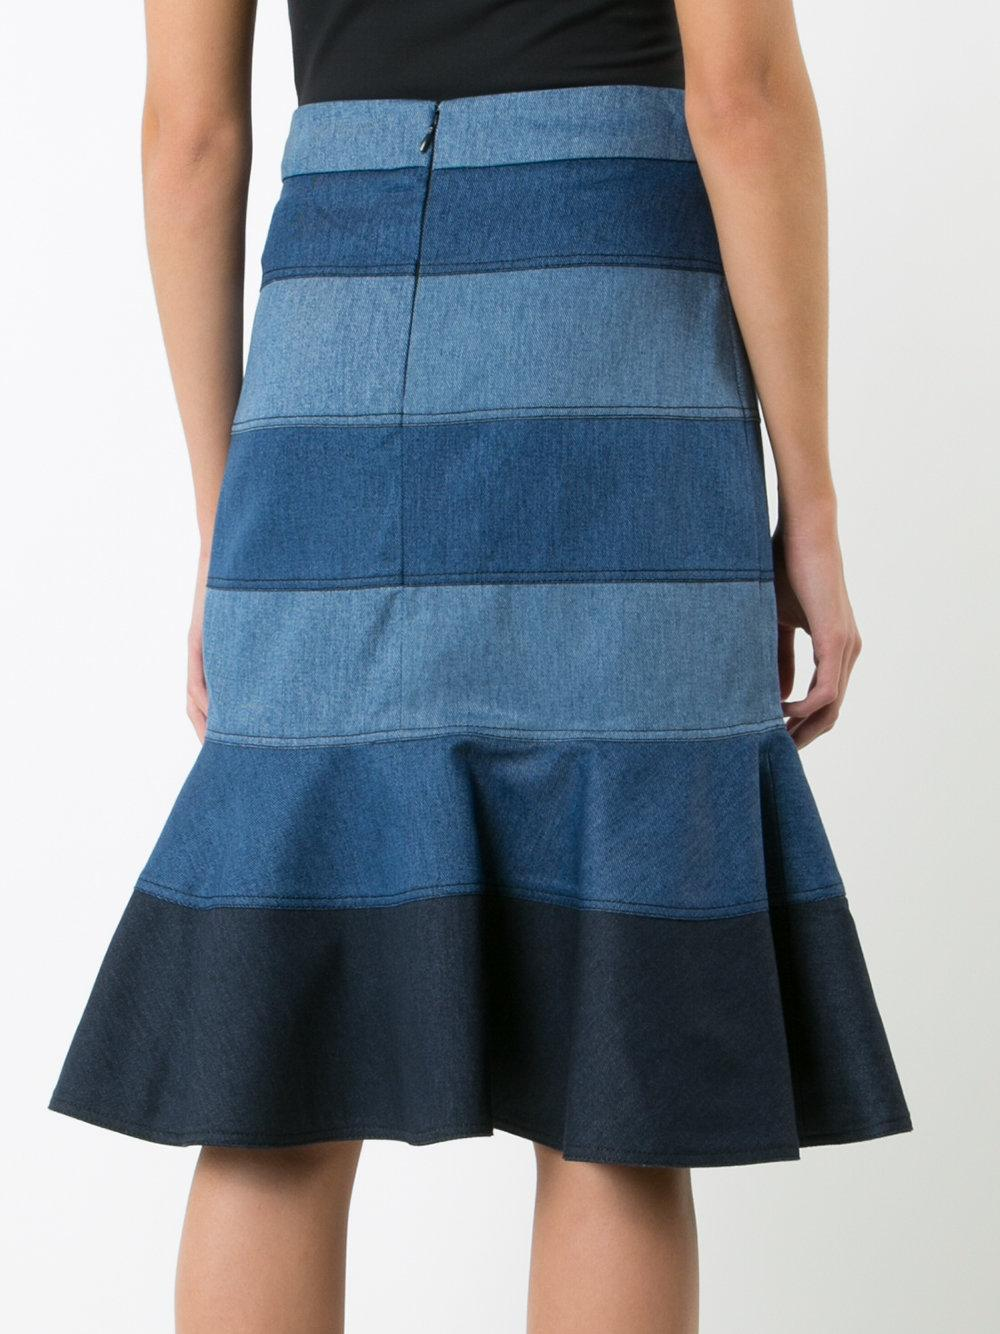 carolina herrera striped denim trumpet skirt in blue lyst